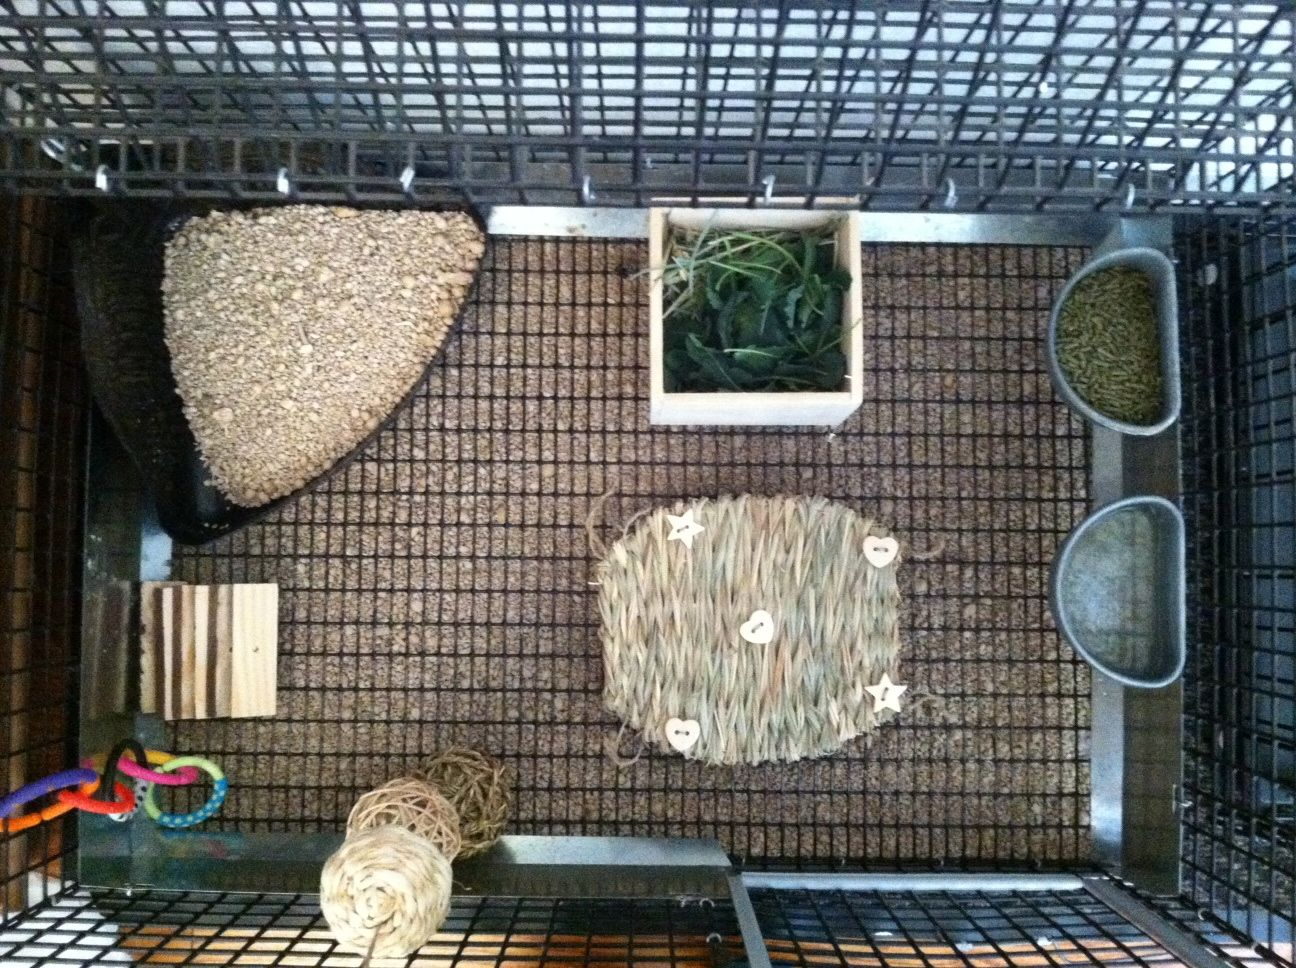 bunny cage setup litter box veggie 39 s wood sticks